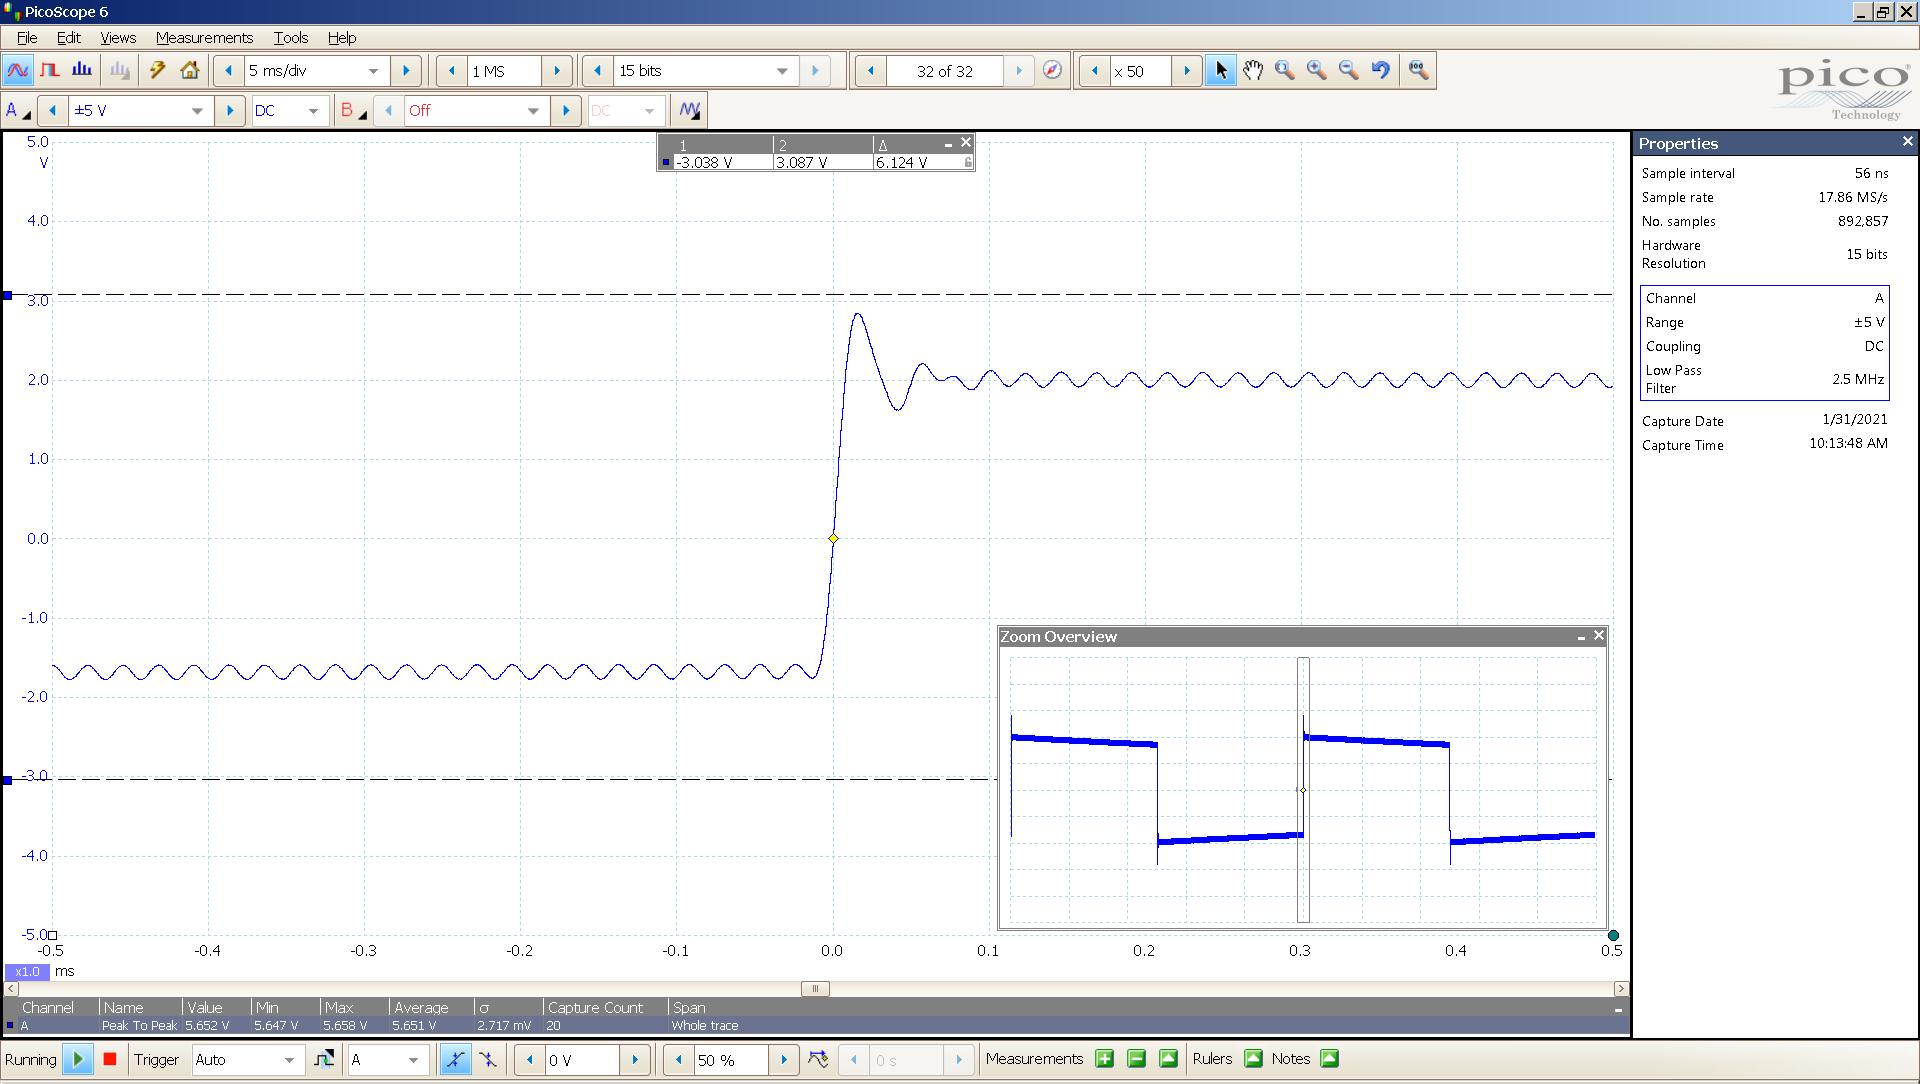 20210131-24 dac2541 40 Hz sqr 5847mVpp 5mS div 5MHz filter AES SE Slow -4 dBFS.png